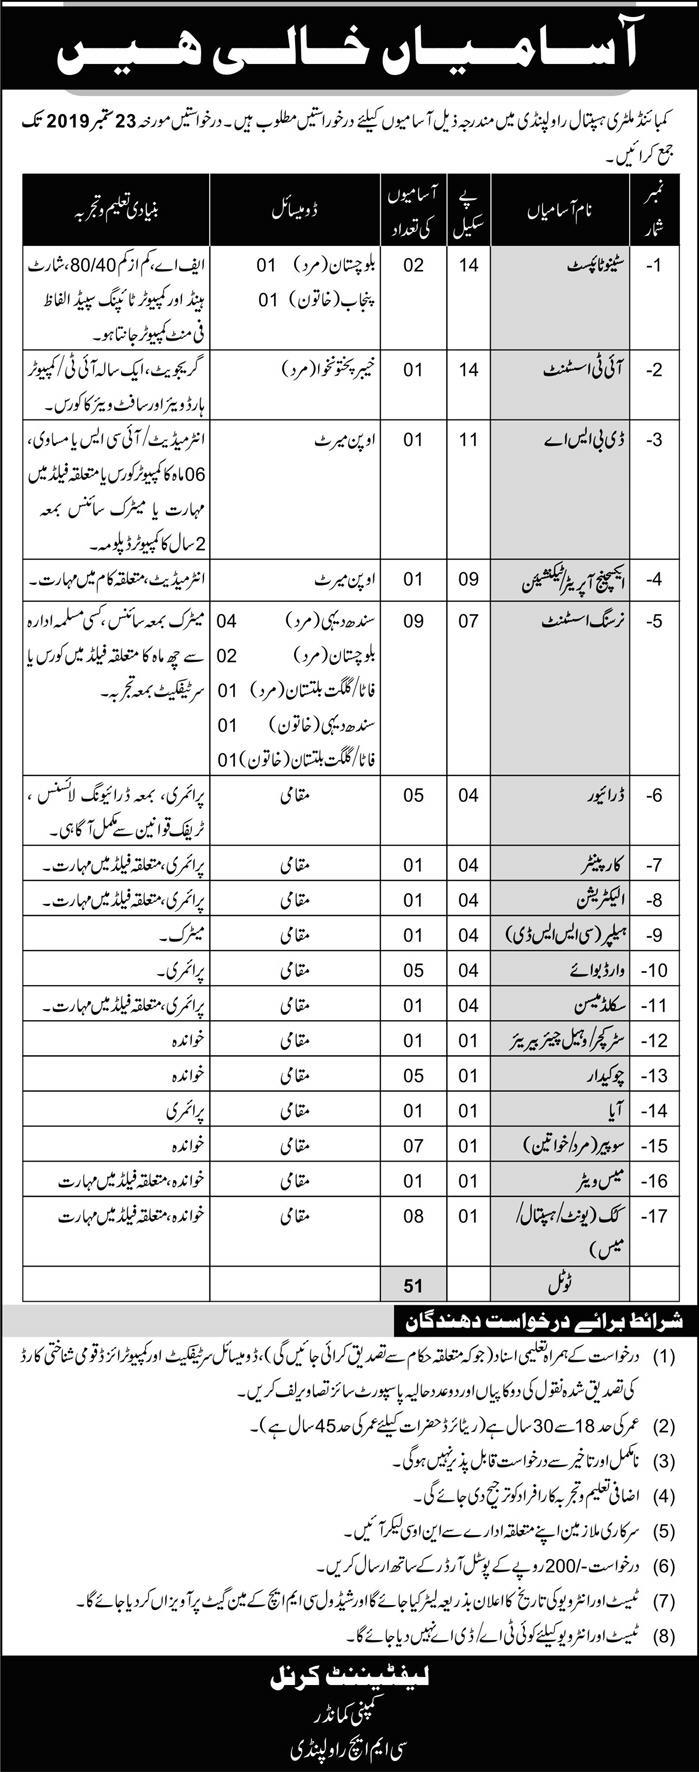 Commandant military hospital Rawalpindi CMH Jobs